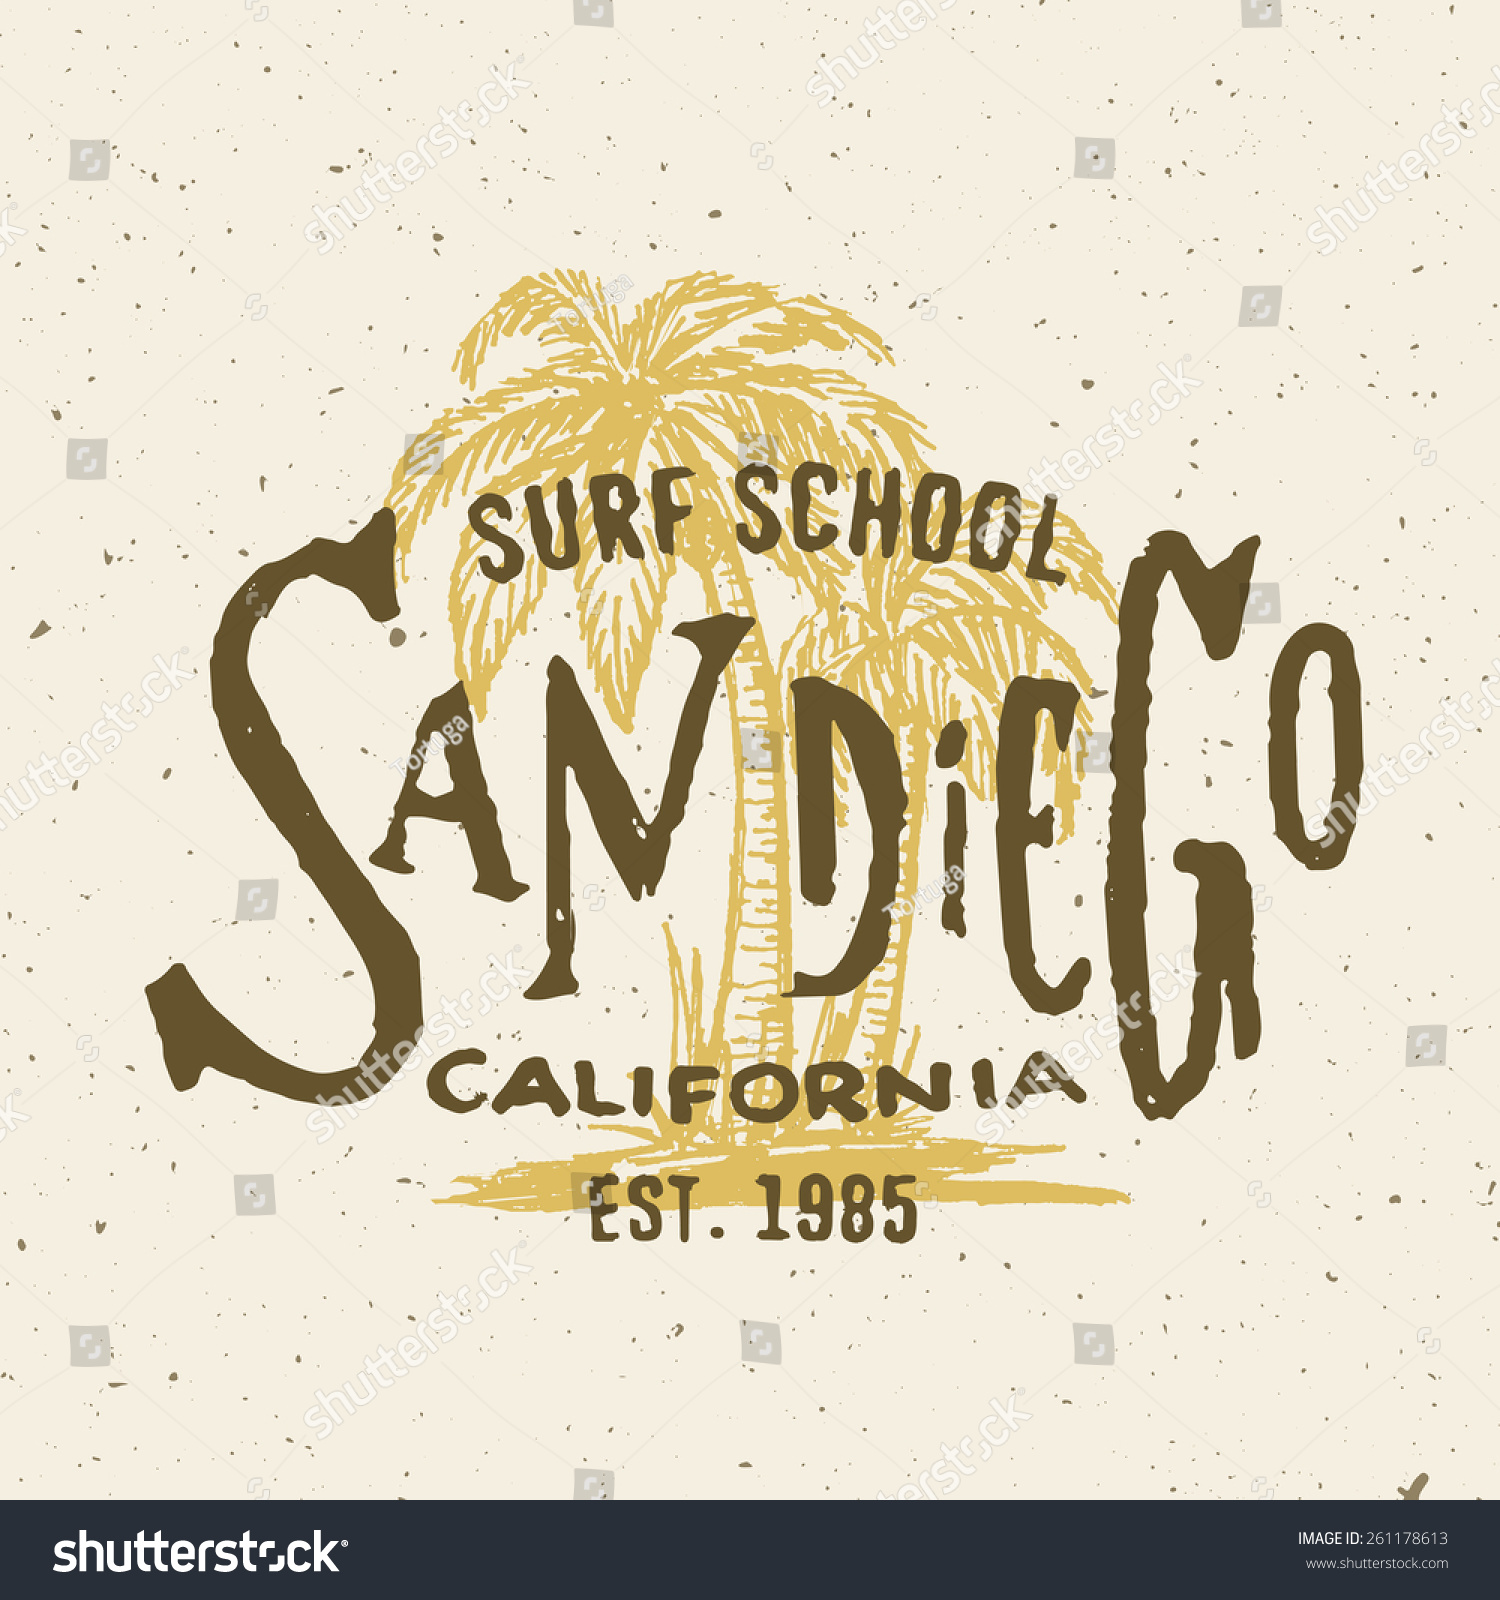 Shirt design san diego - San Diego California Surf School T Shirt Graphic Vintage Apparel Fashion Tee Design Retro